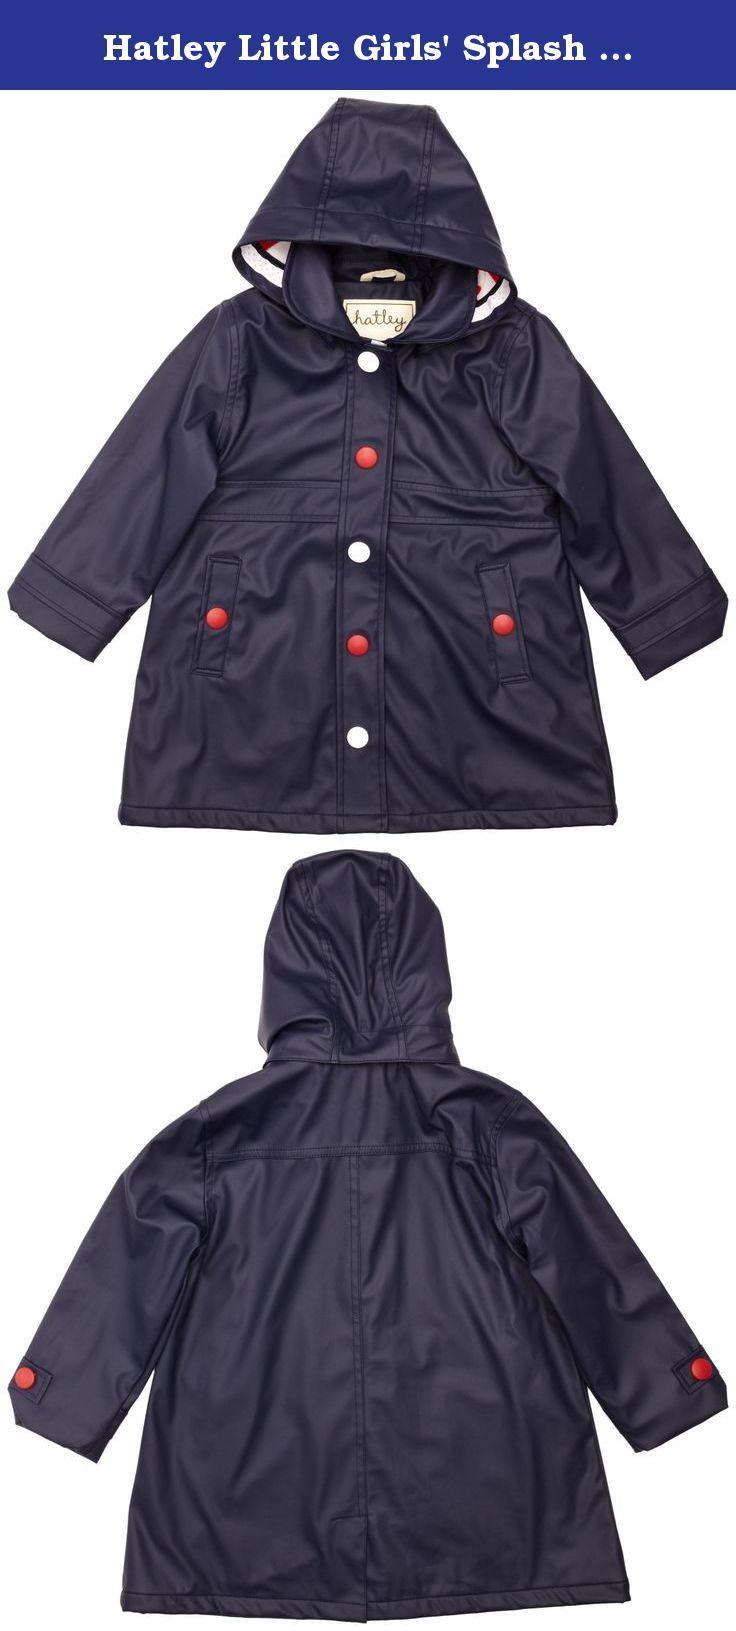 2b667c7b2d88 Hatley Little Girls  Splash Jacket